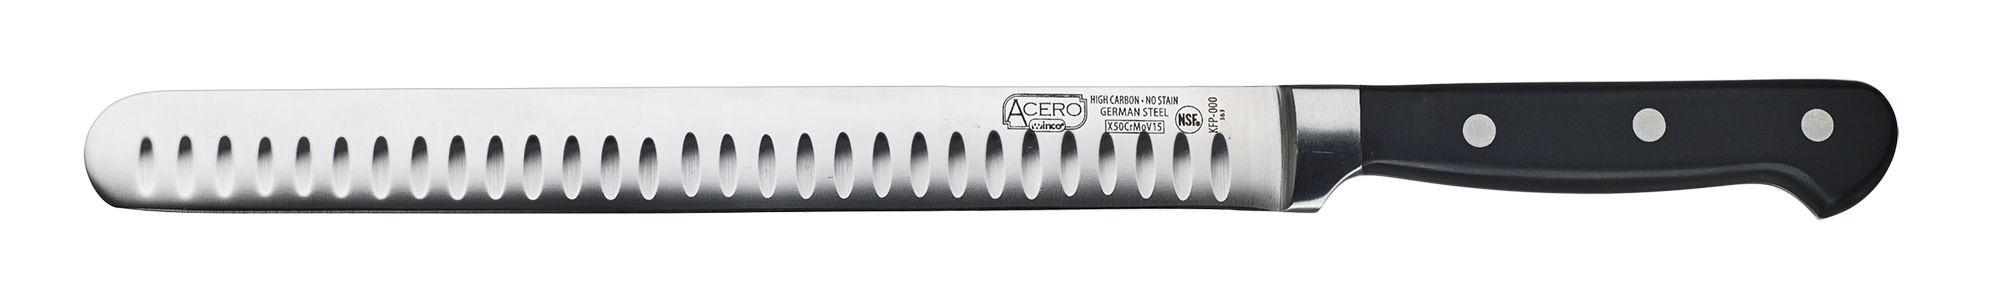 "Winco KFP-102 Fish/Roast Granton Edge Slicer with POM Handle 10"""